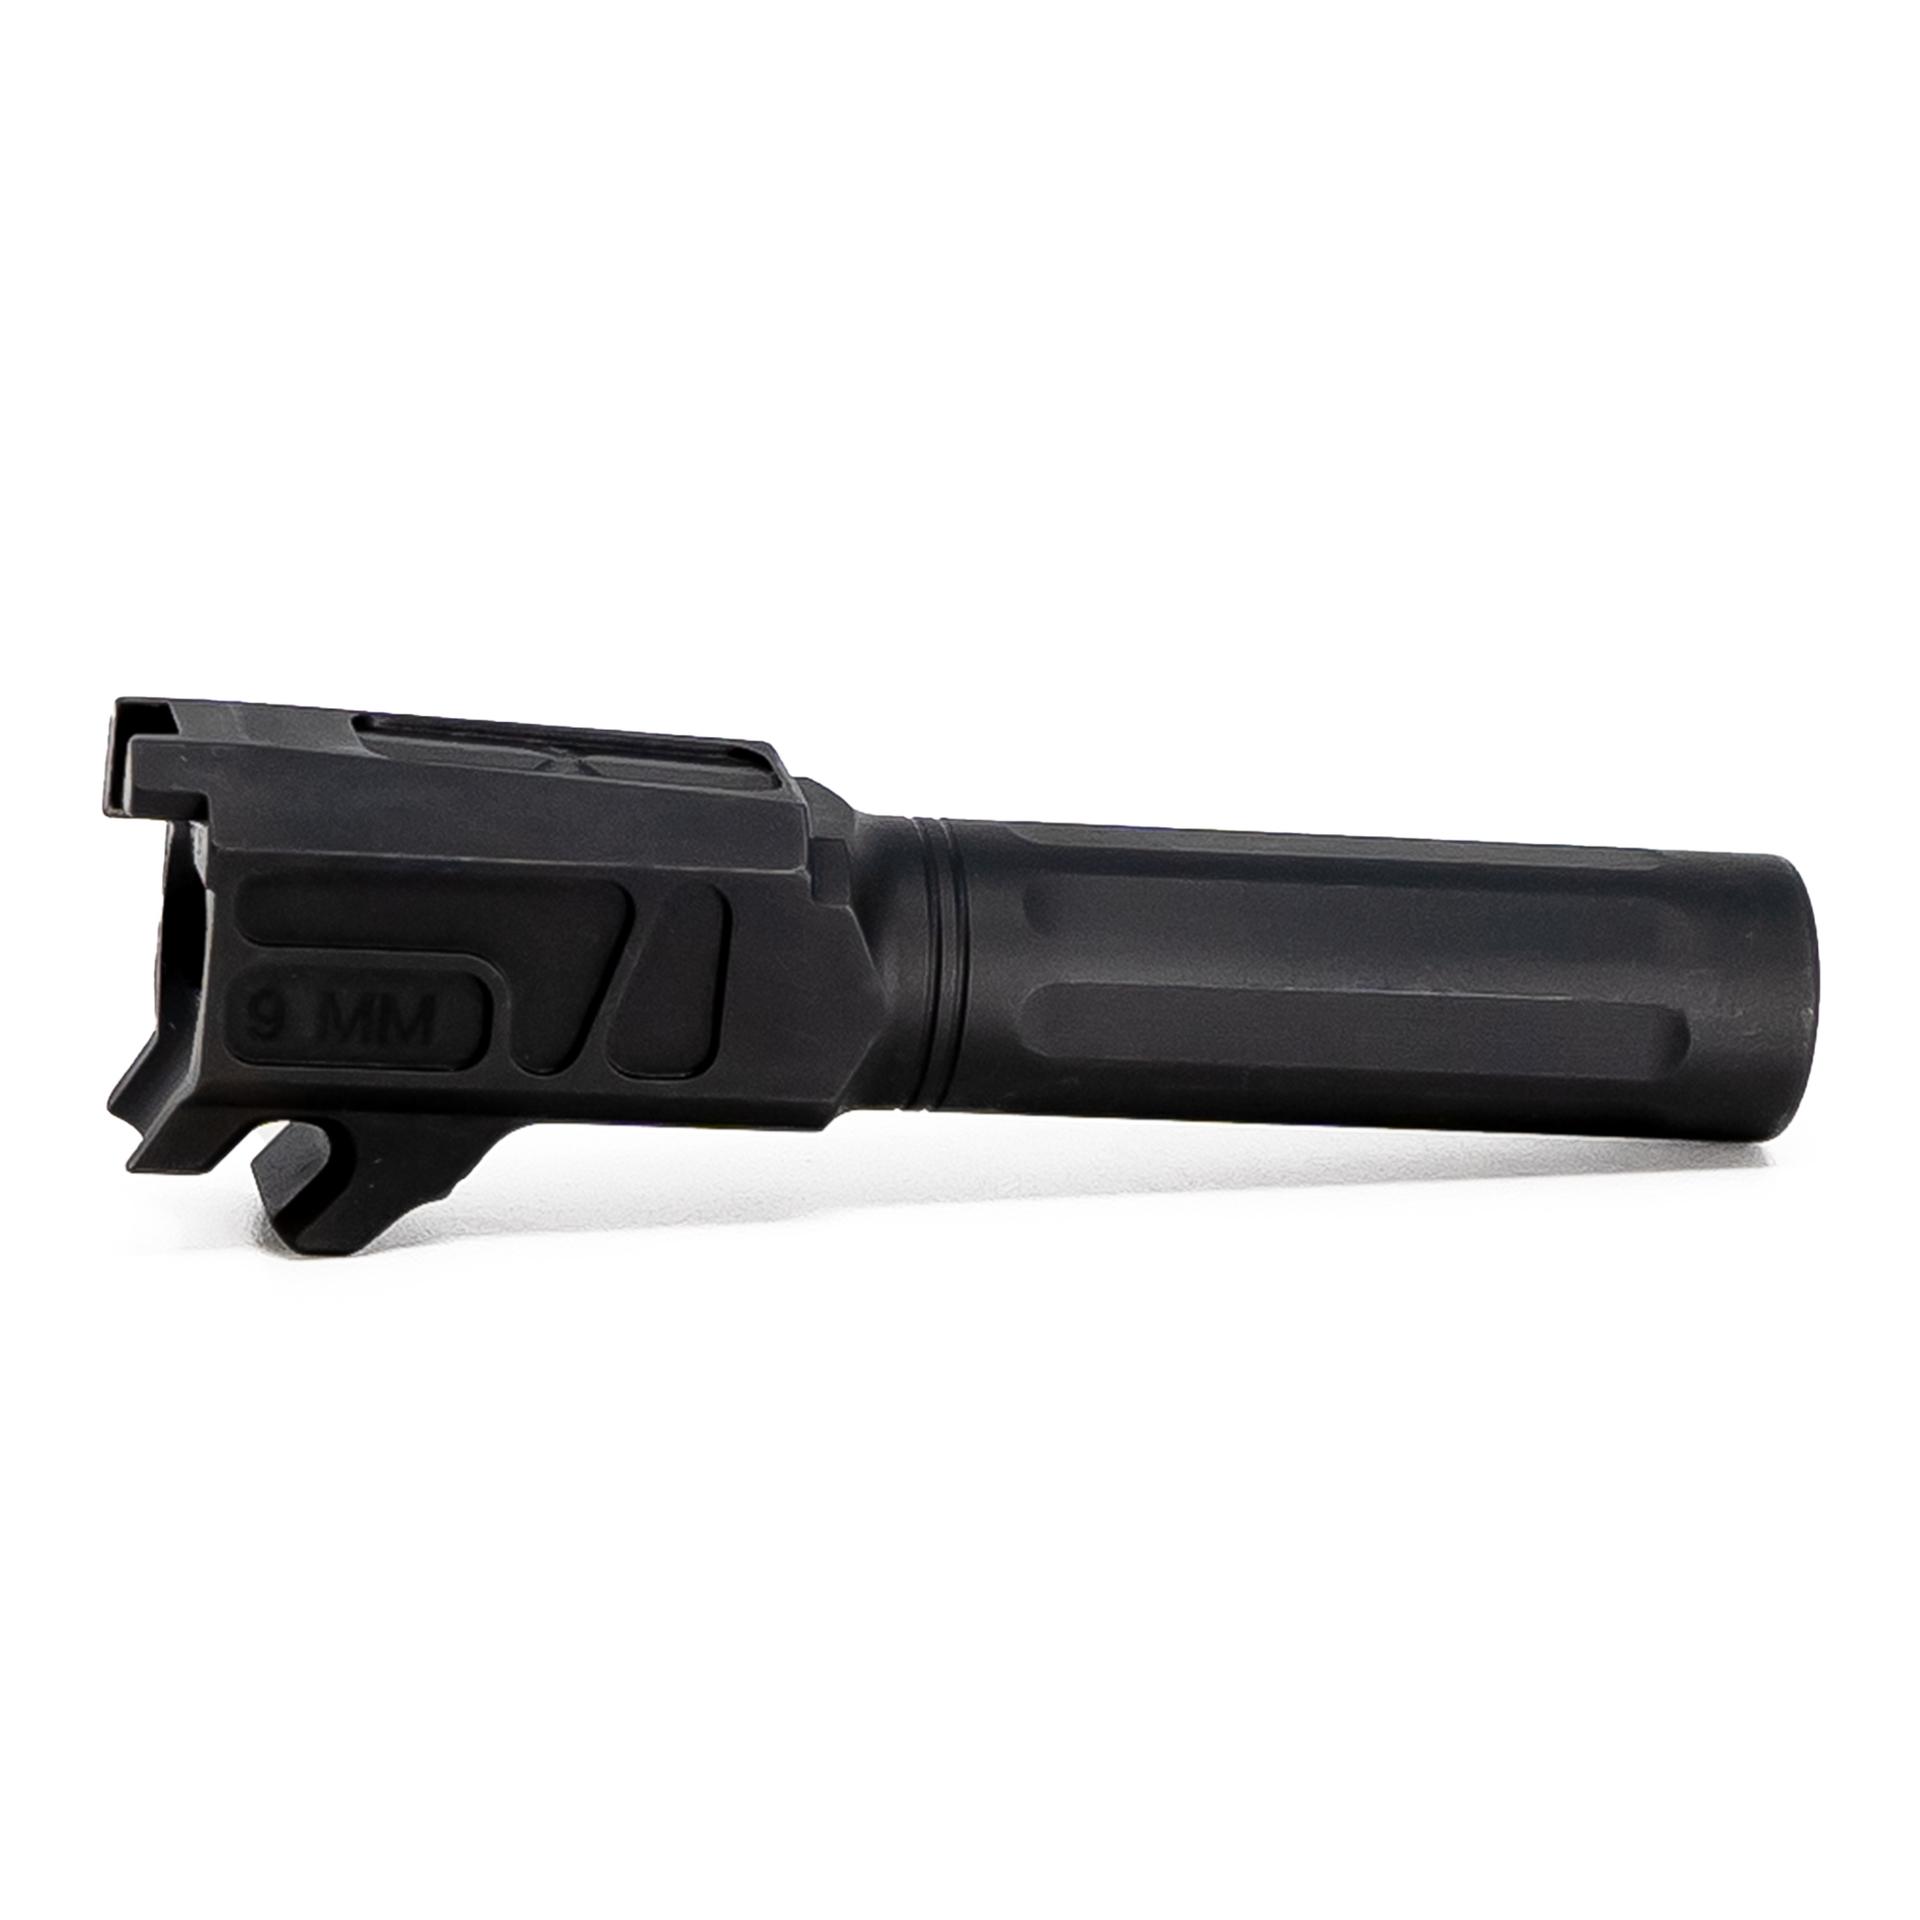 faxon firearms sig p365 p365xl match series barrels threaded barrel tin coated target crown